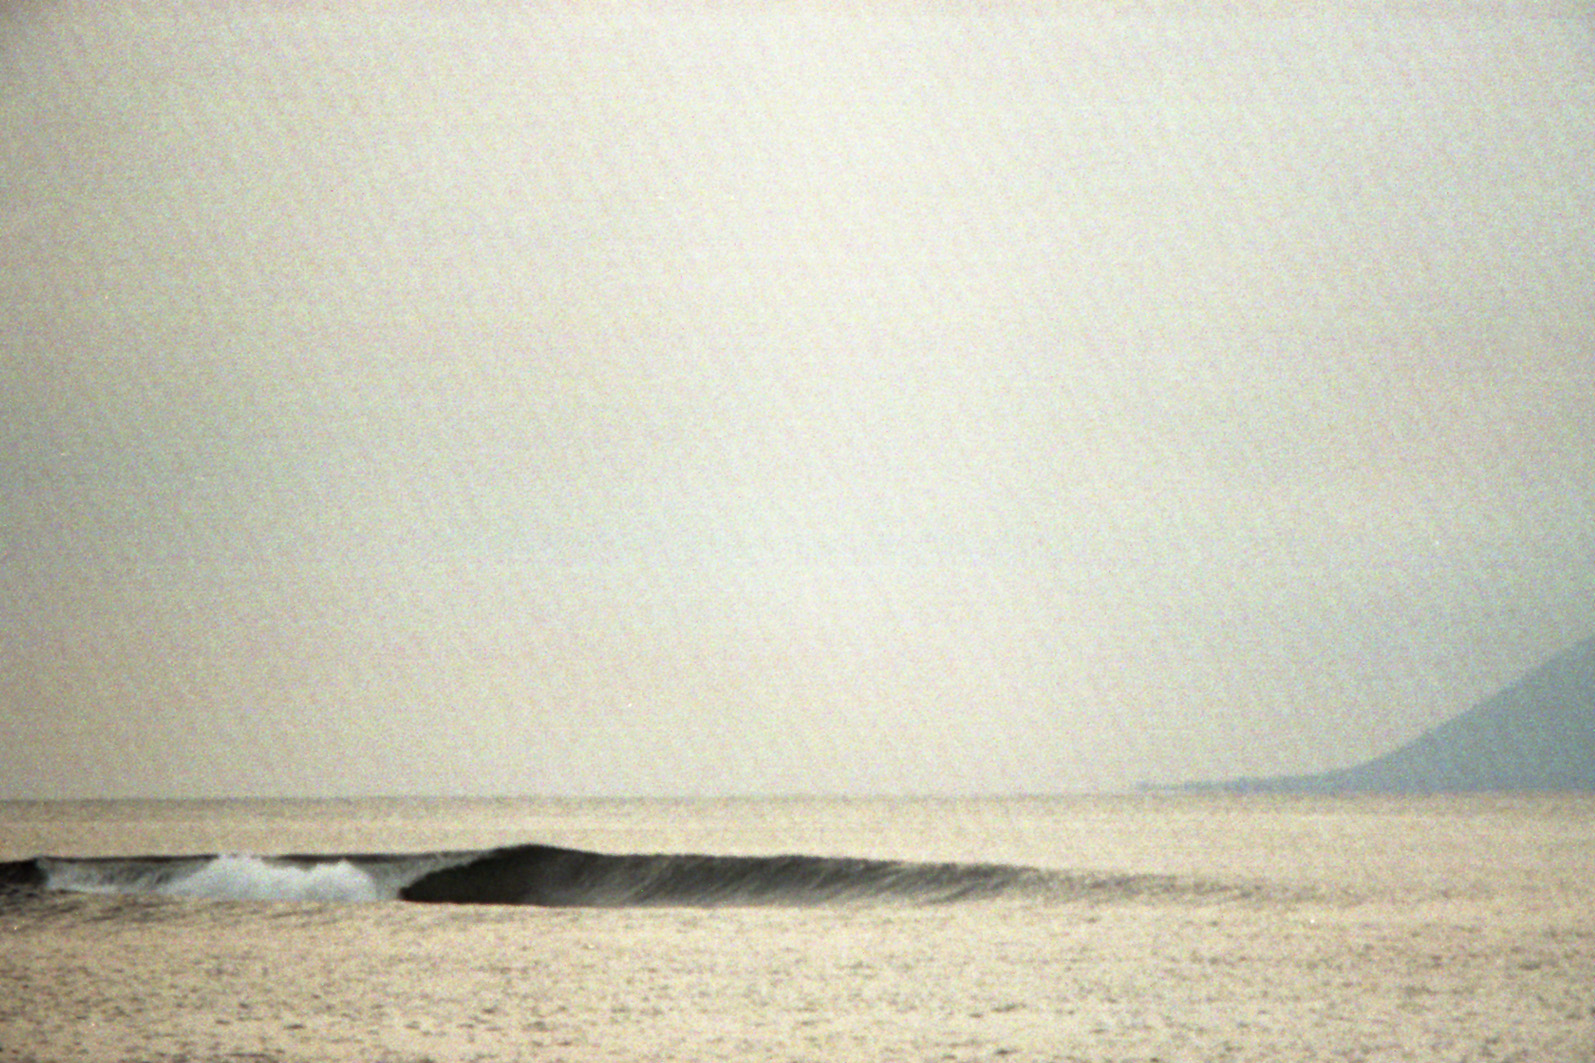 Breaking Wave at Lakeys